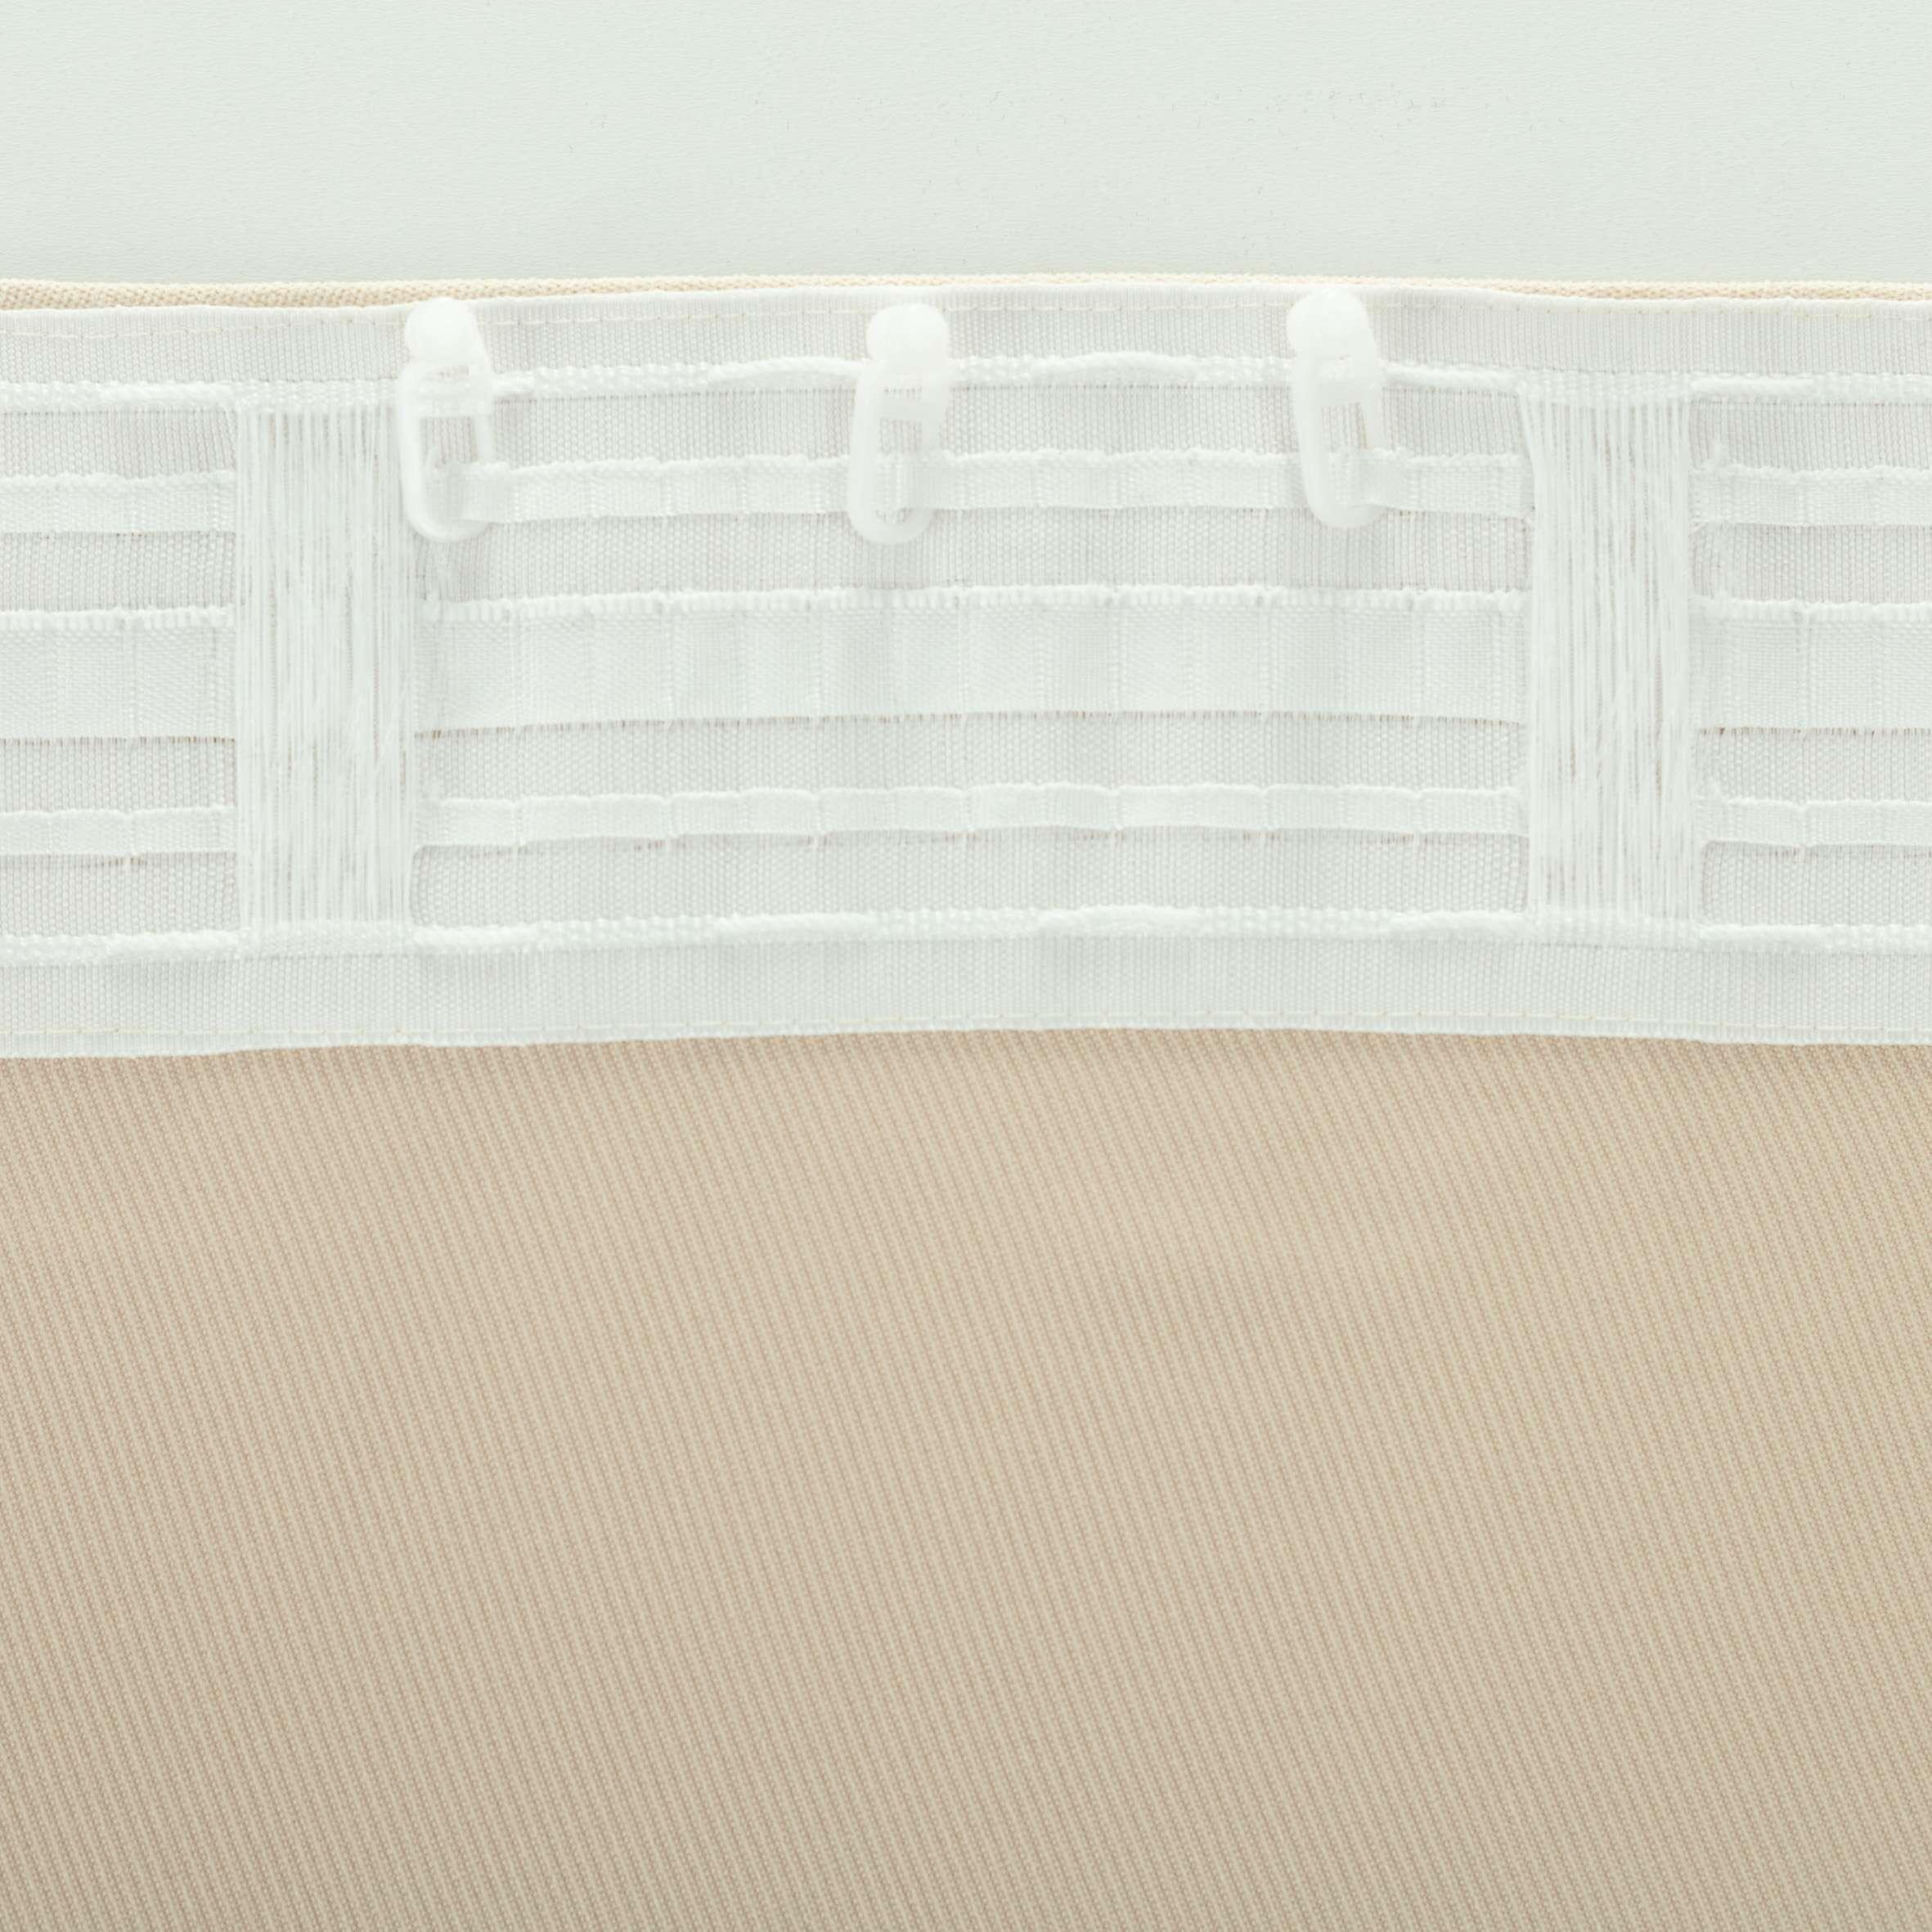 Fertigvorhang BASIC mit Kräuselband 140x260cm creme